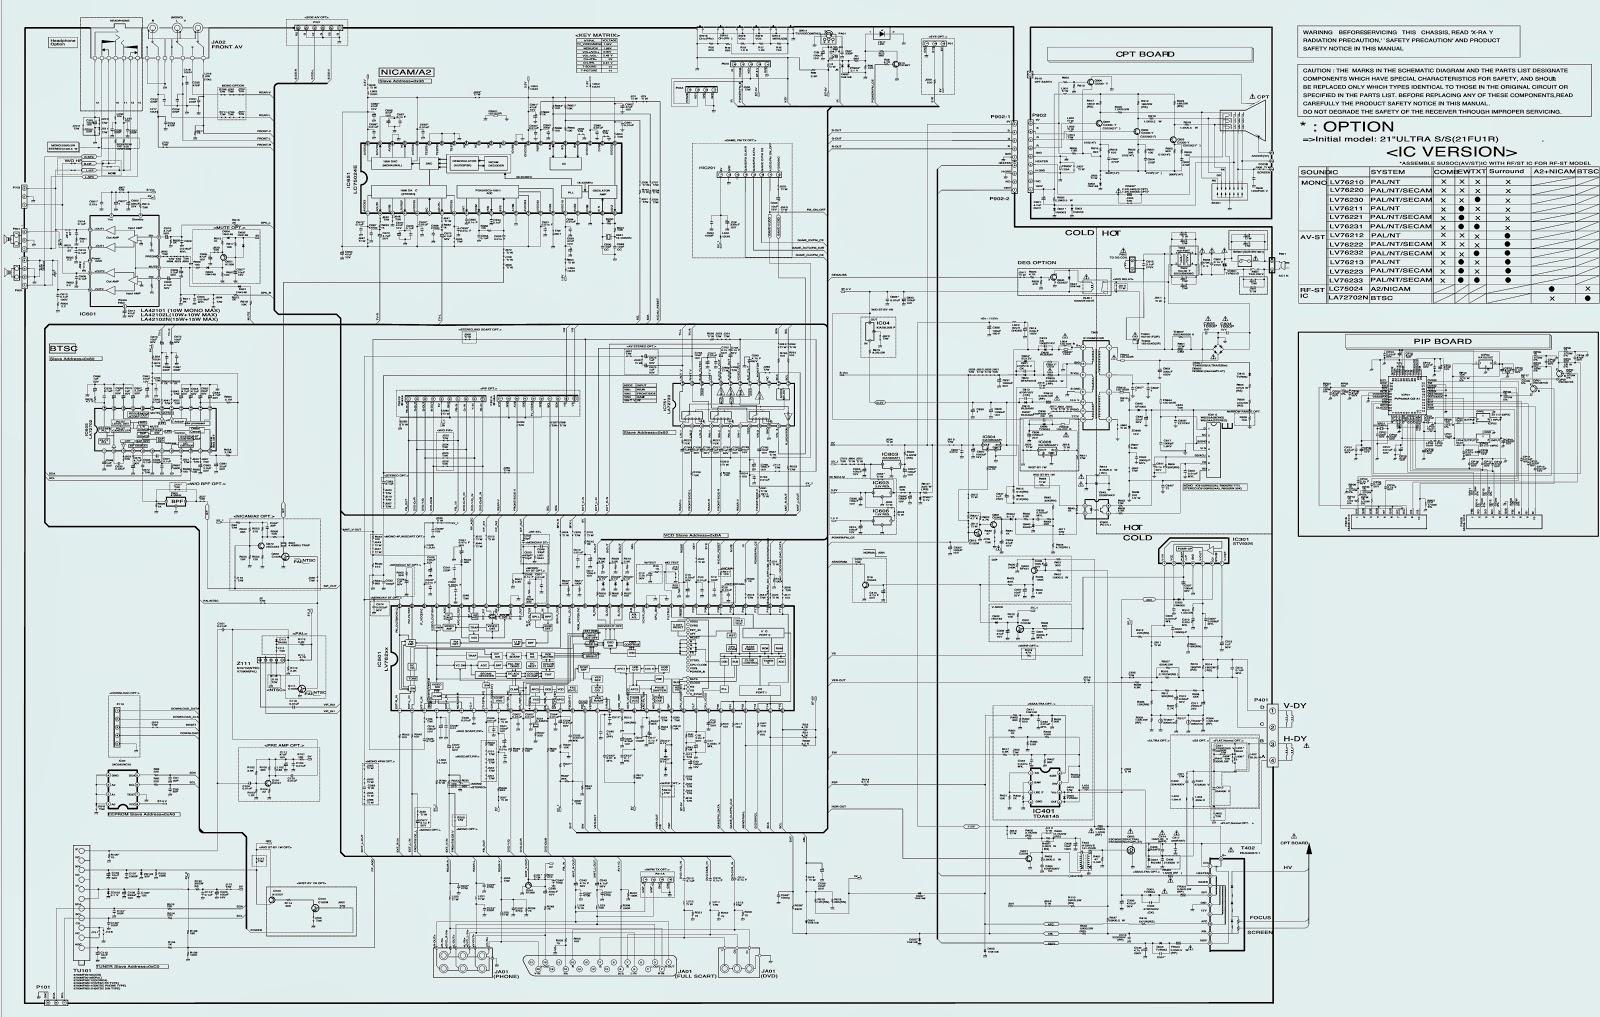 cpt wiring diagram